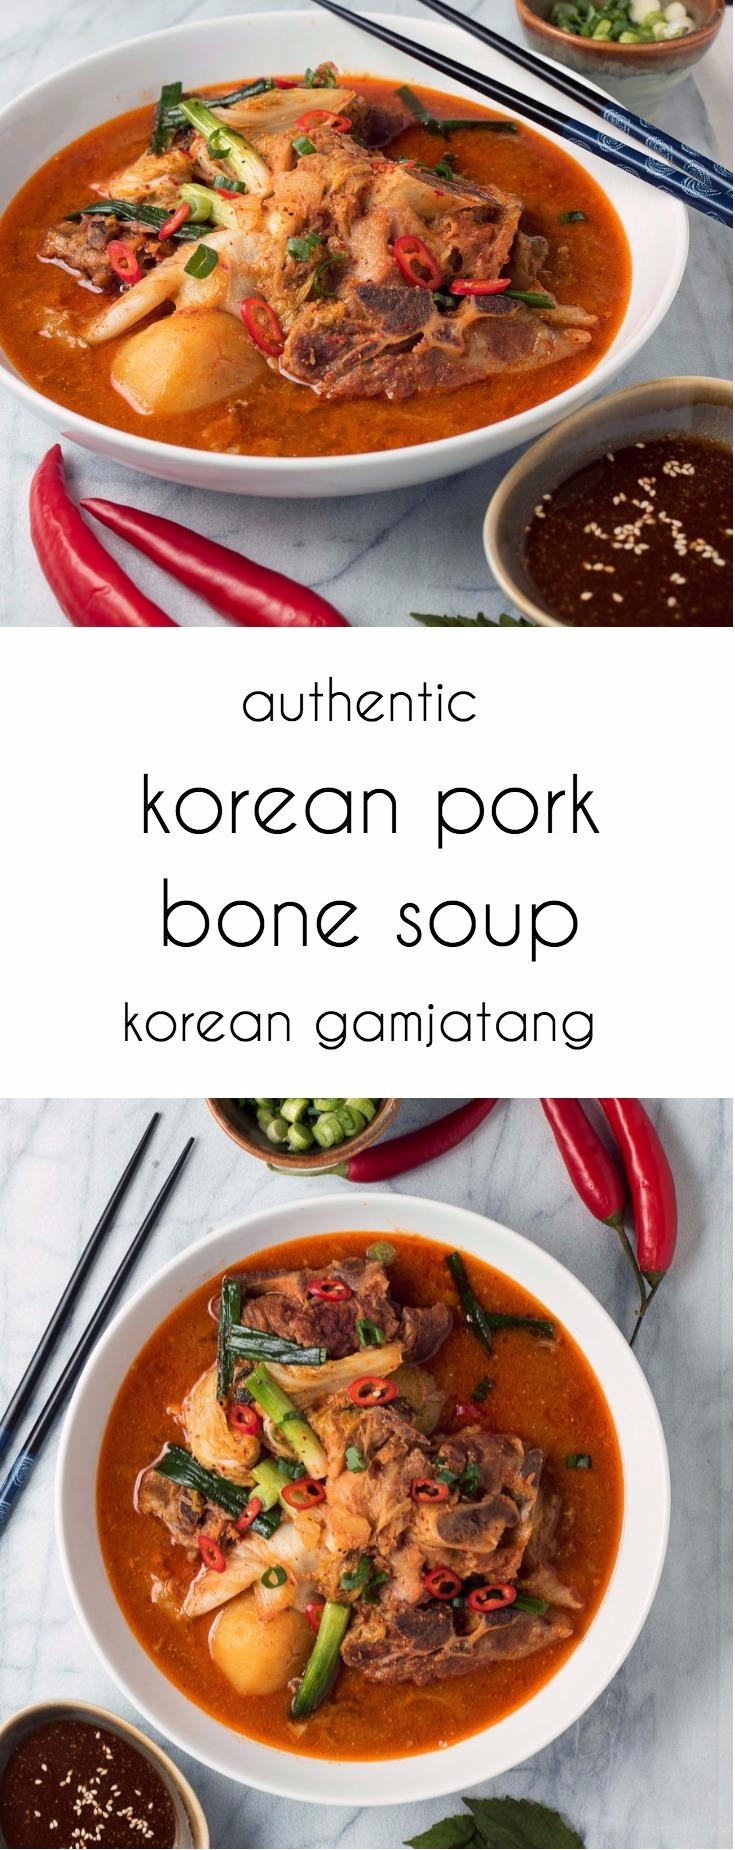 Korean pork neck bone soup - gamjatang. This is real foodie cooking!